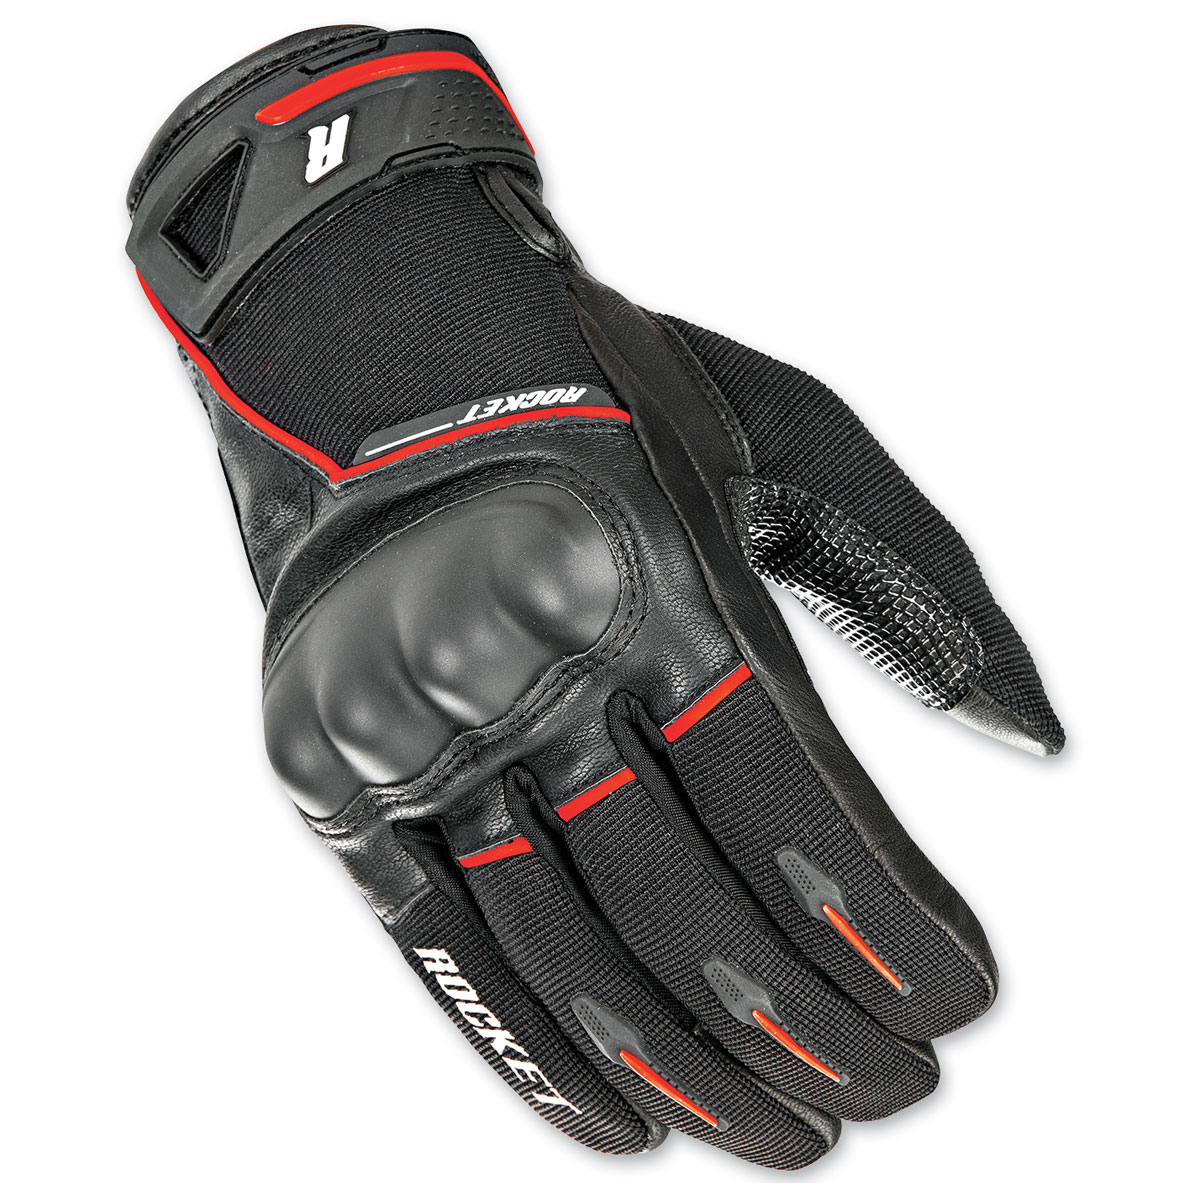 Joe Rocket Men's Super Moto Black/Red Gloves